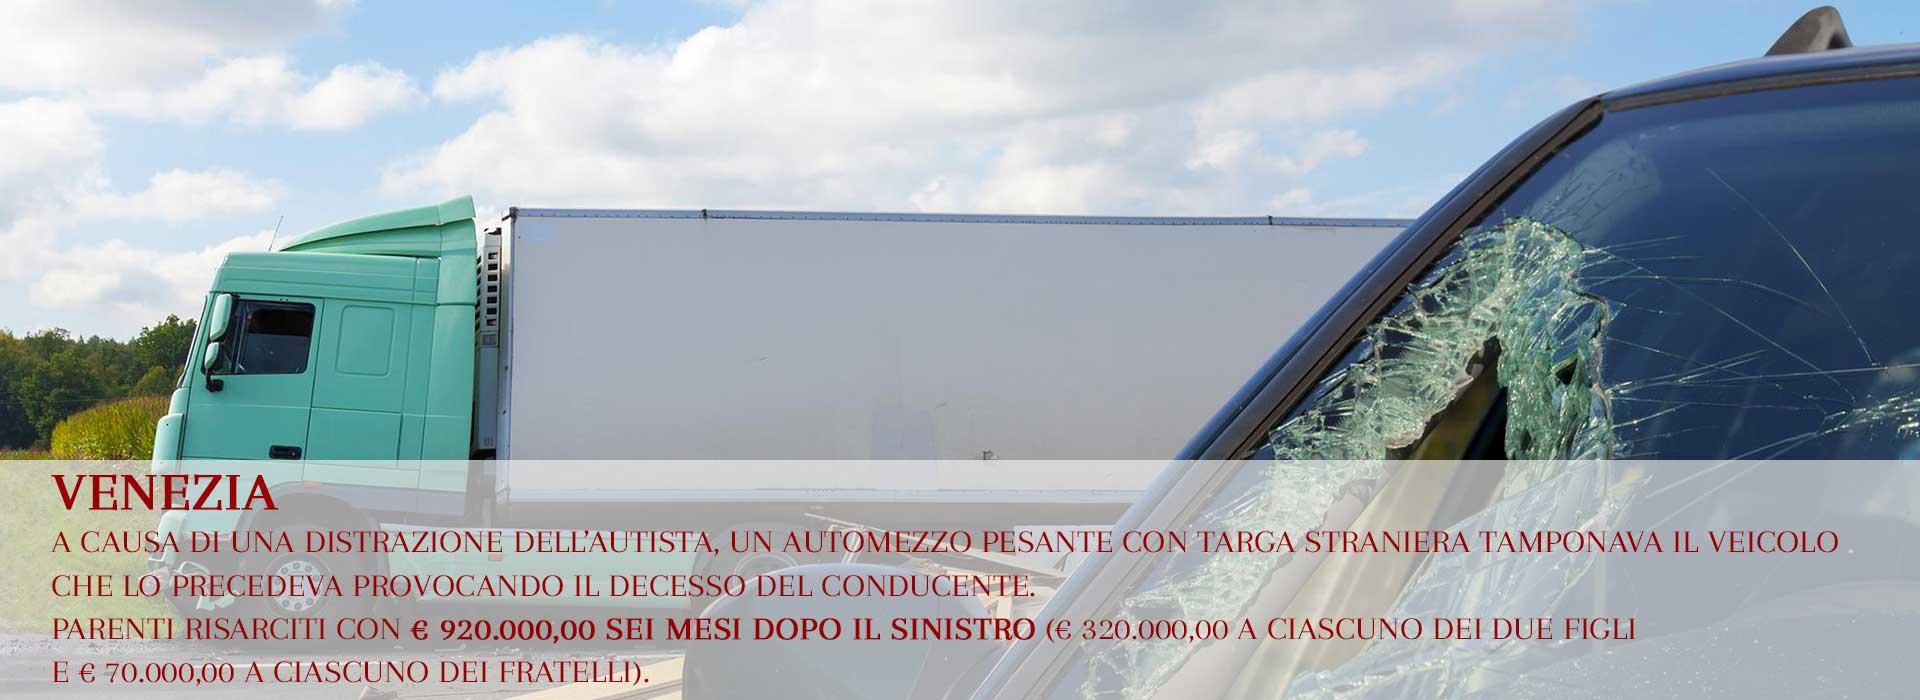 venezia-text